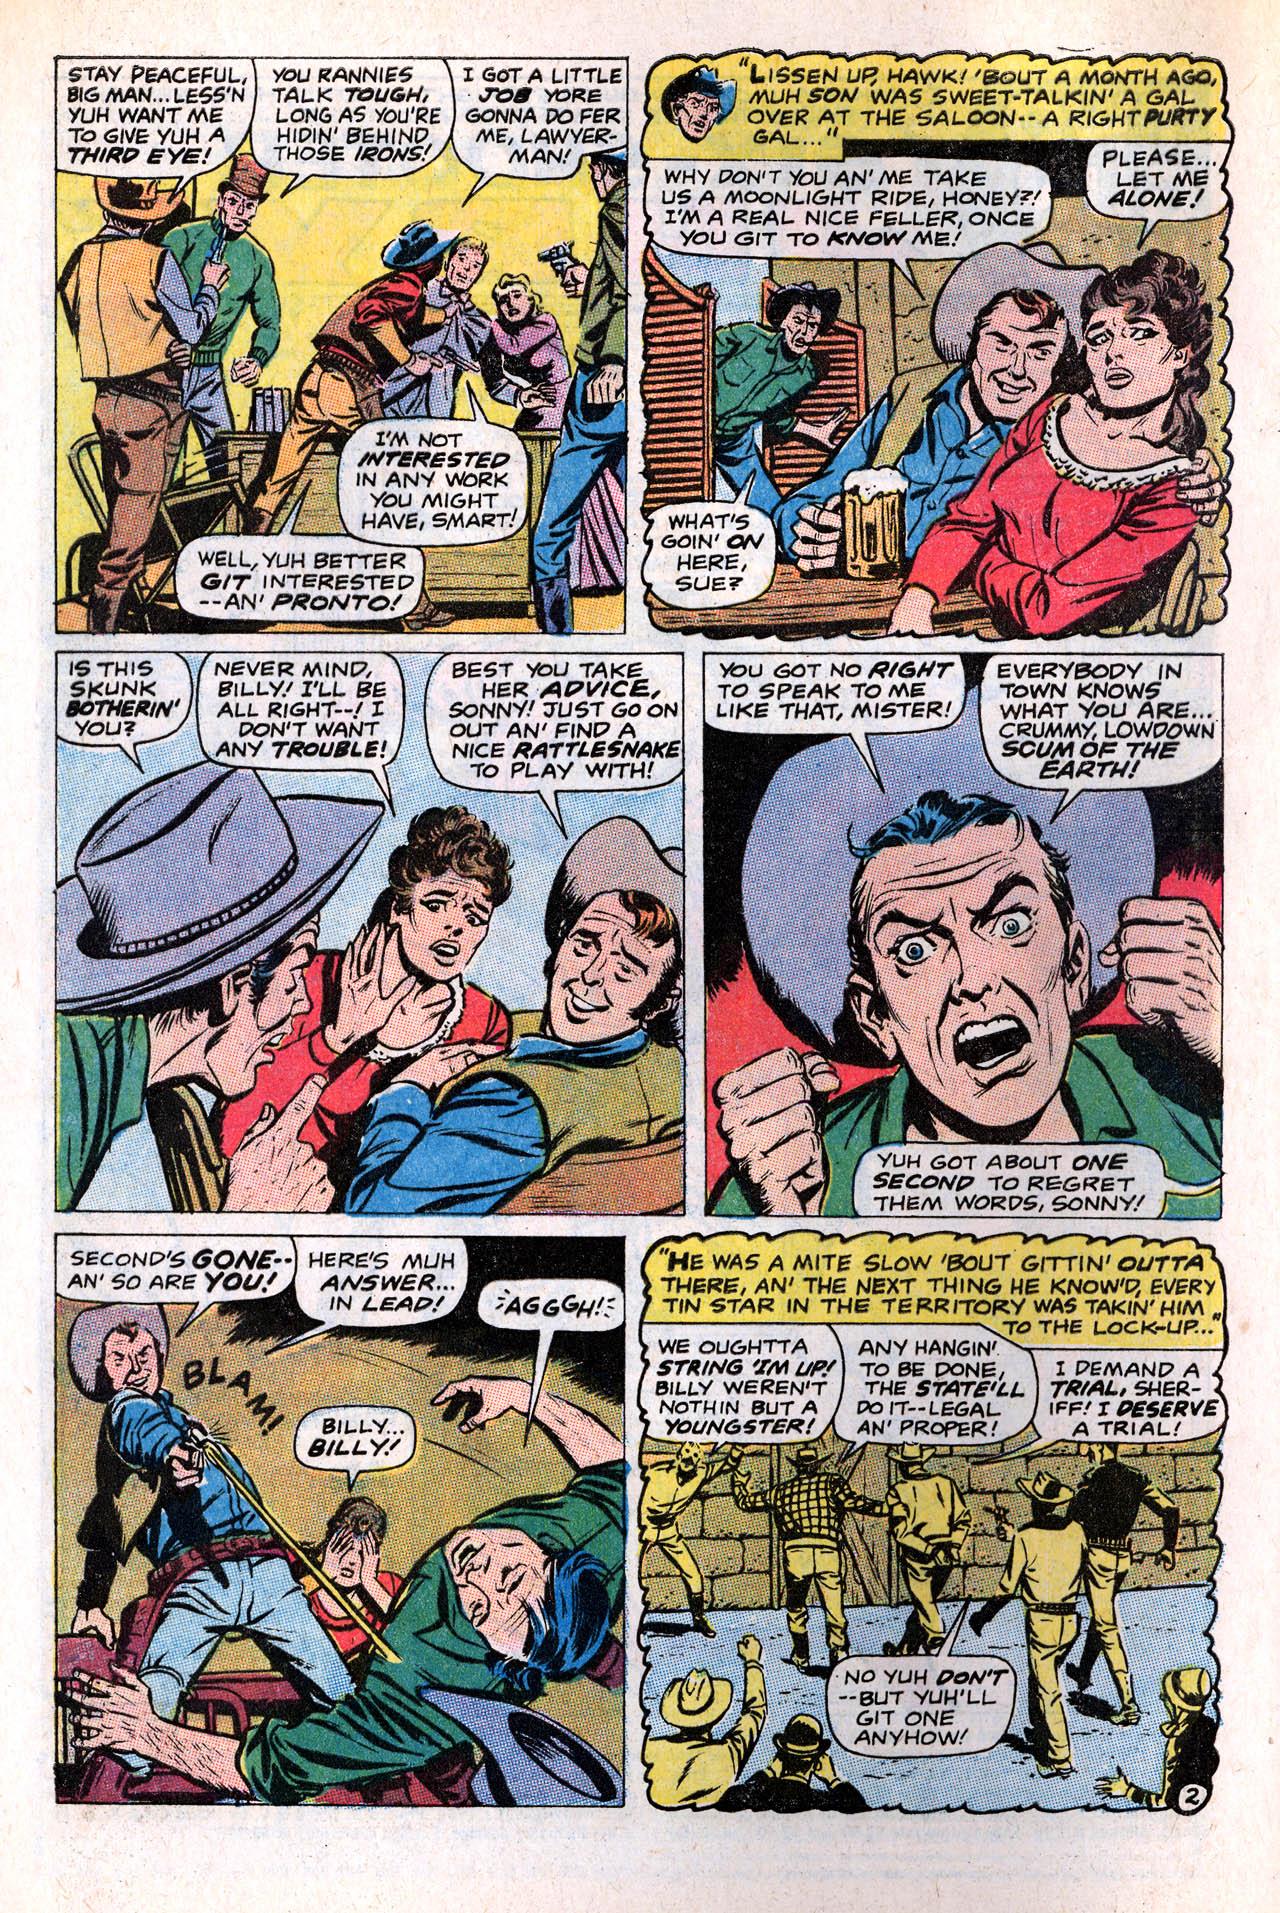 Read online Two-Gun Kid comic -  Issue #98 - 4